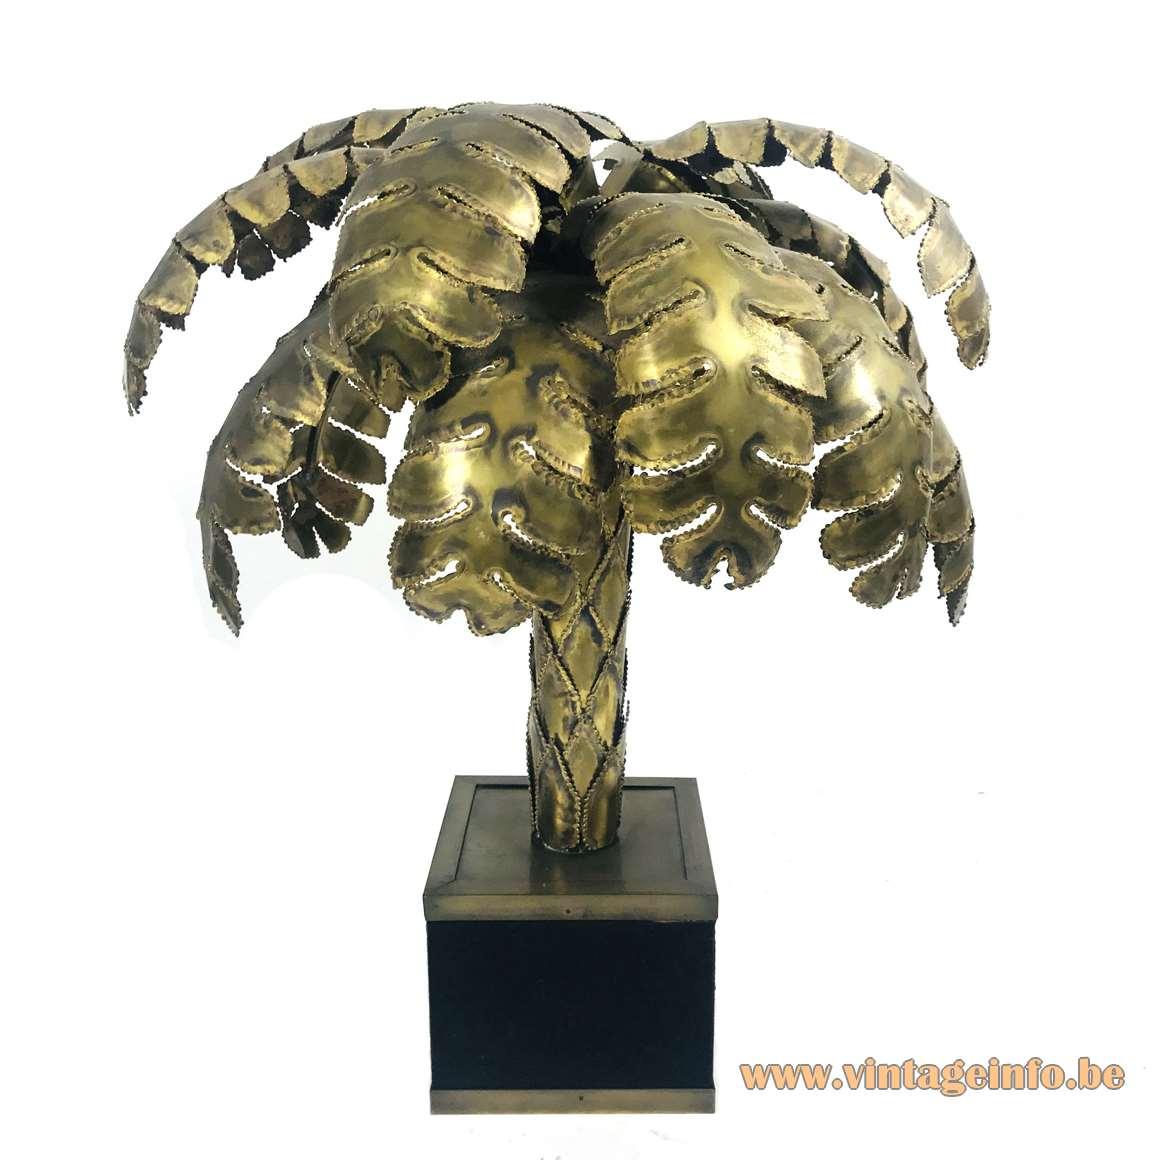 Maison Jansen palm tree table lamp square black base burned brass leaves & trunk 1970s 1980s France